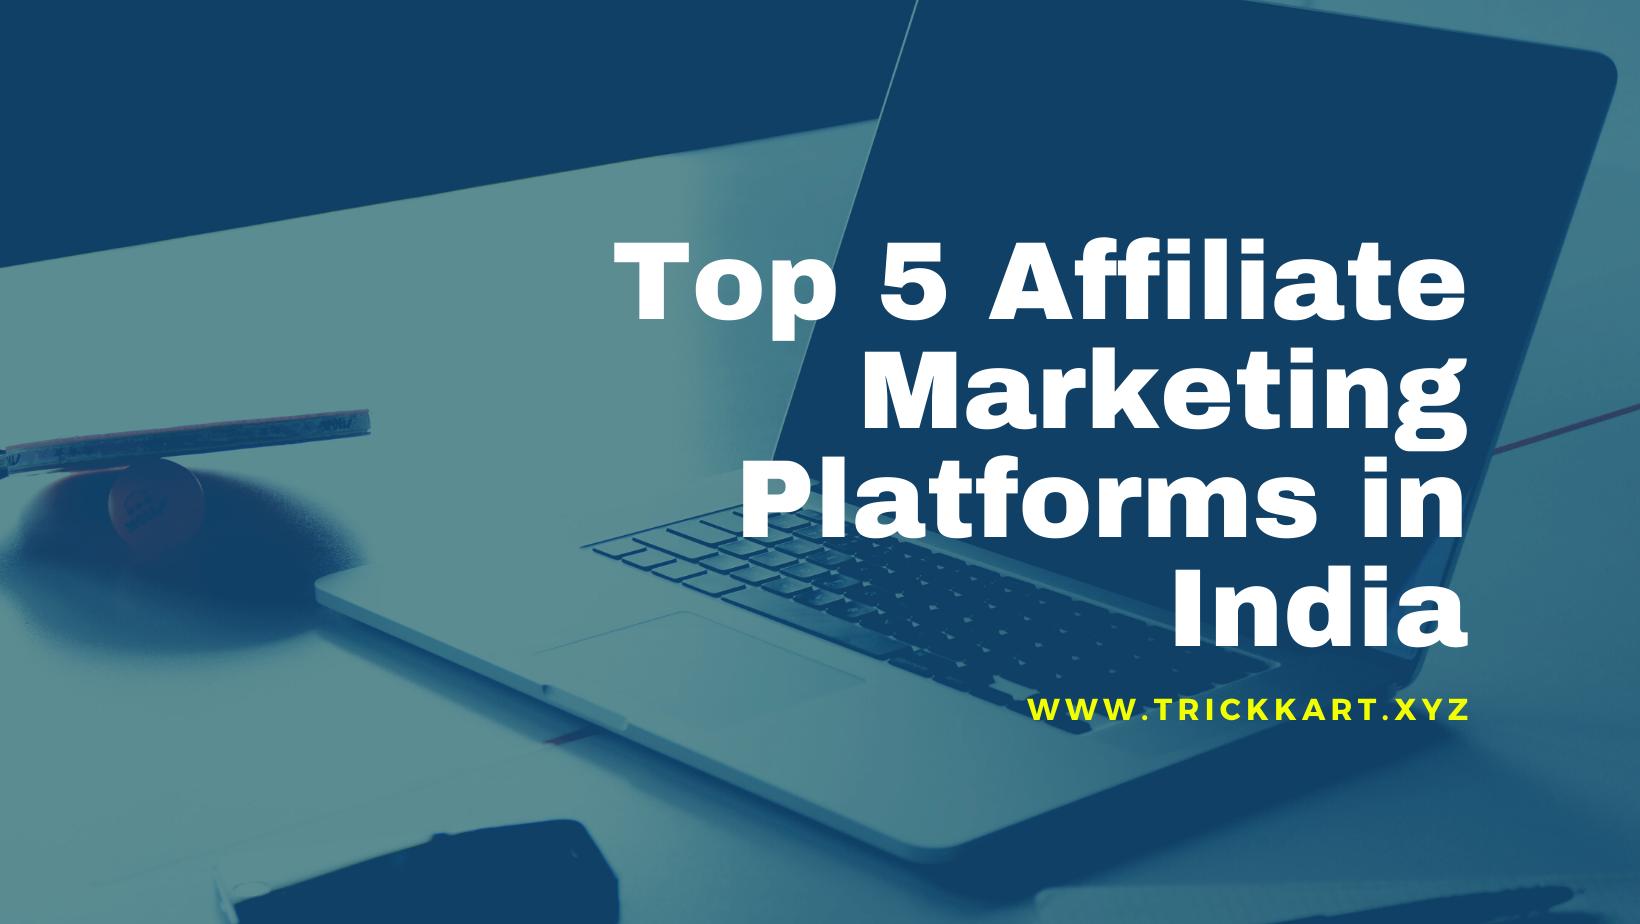 Top 5 Affiliate Marketing Platforms in India